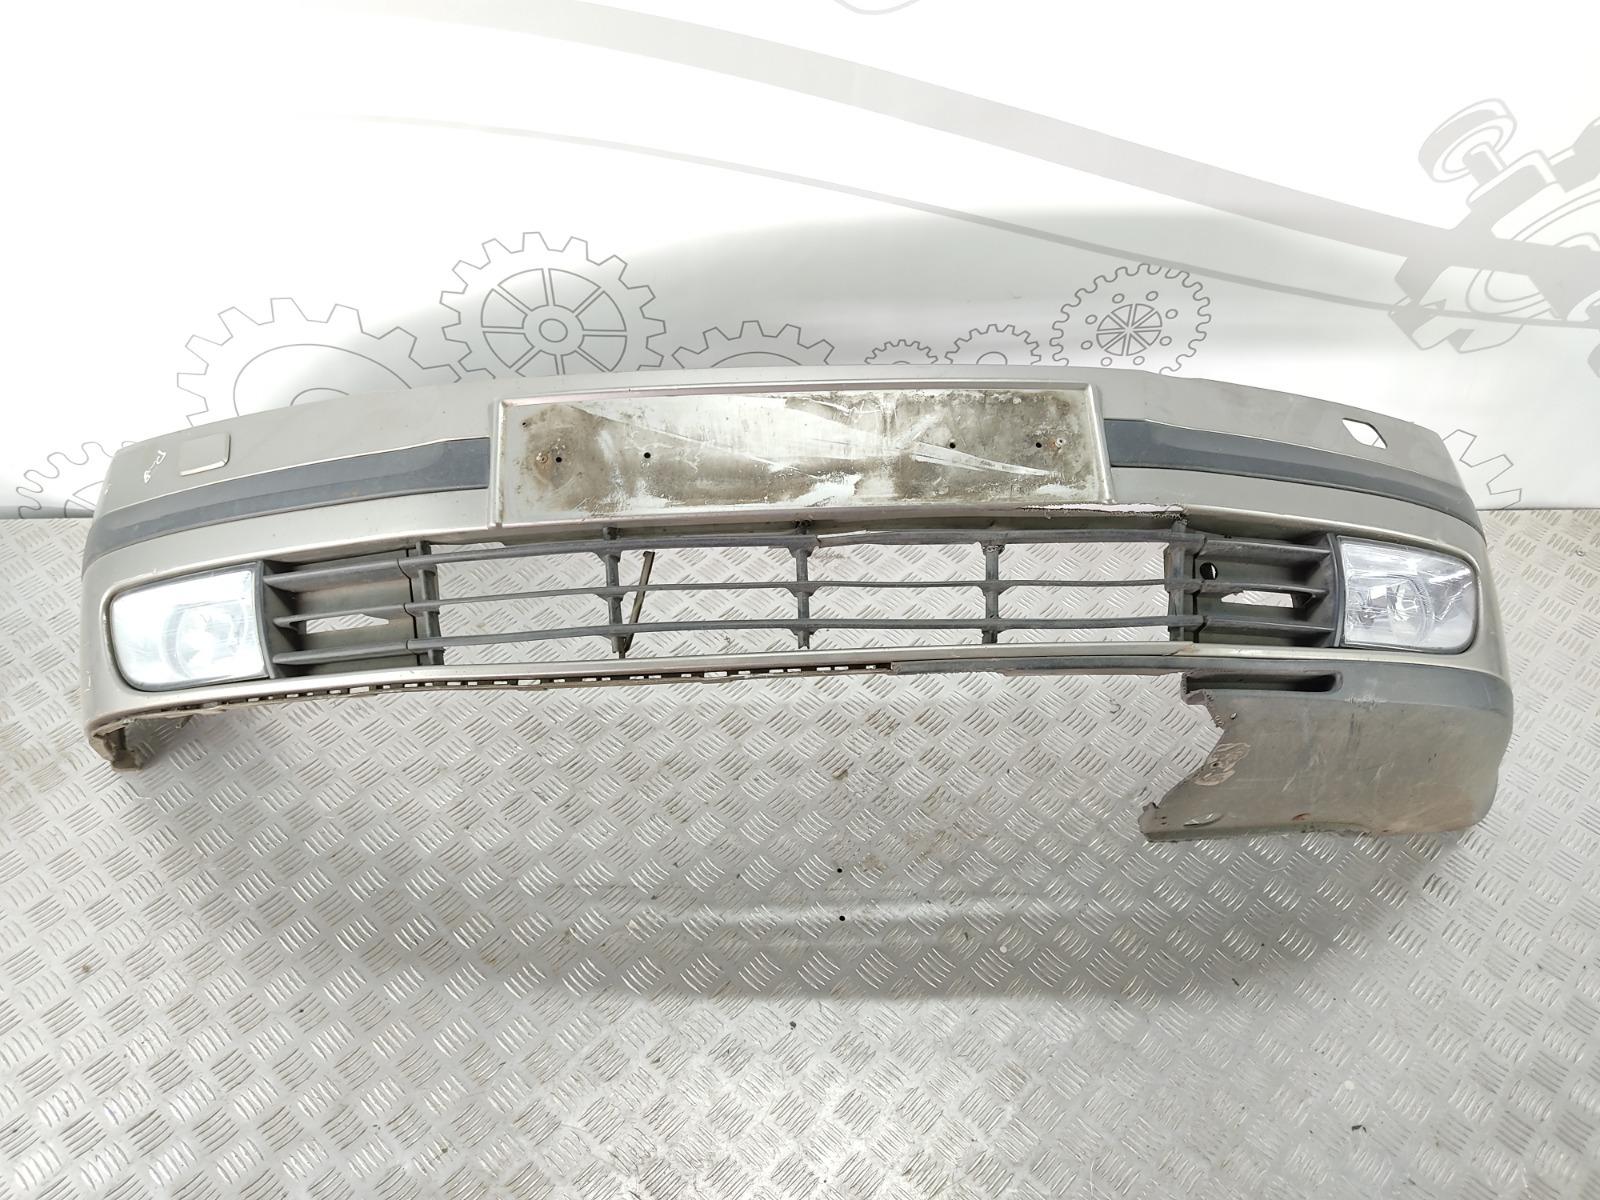 Бампер передний Skoda Octavia 1.9 TDI 2008 (б/у)